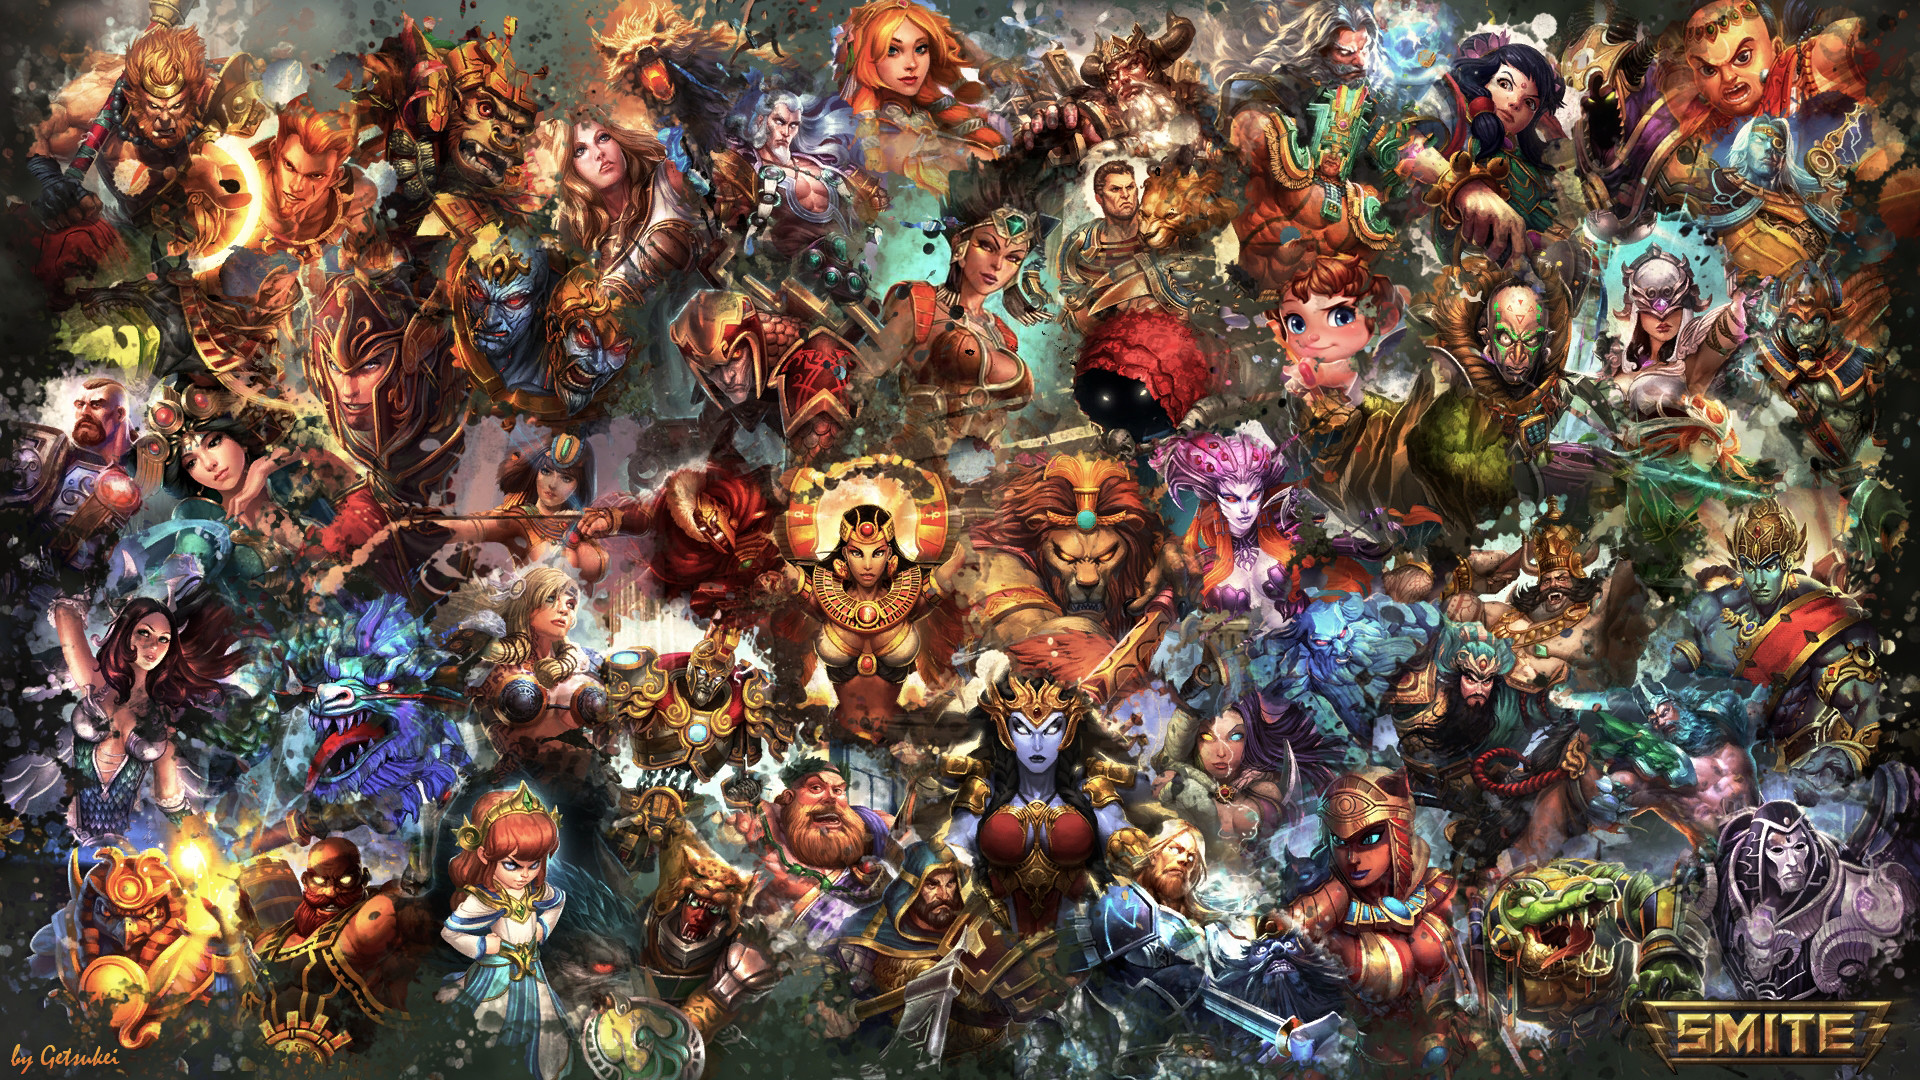 Video Game – Smite Video Game Wallpaper